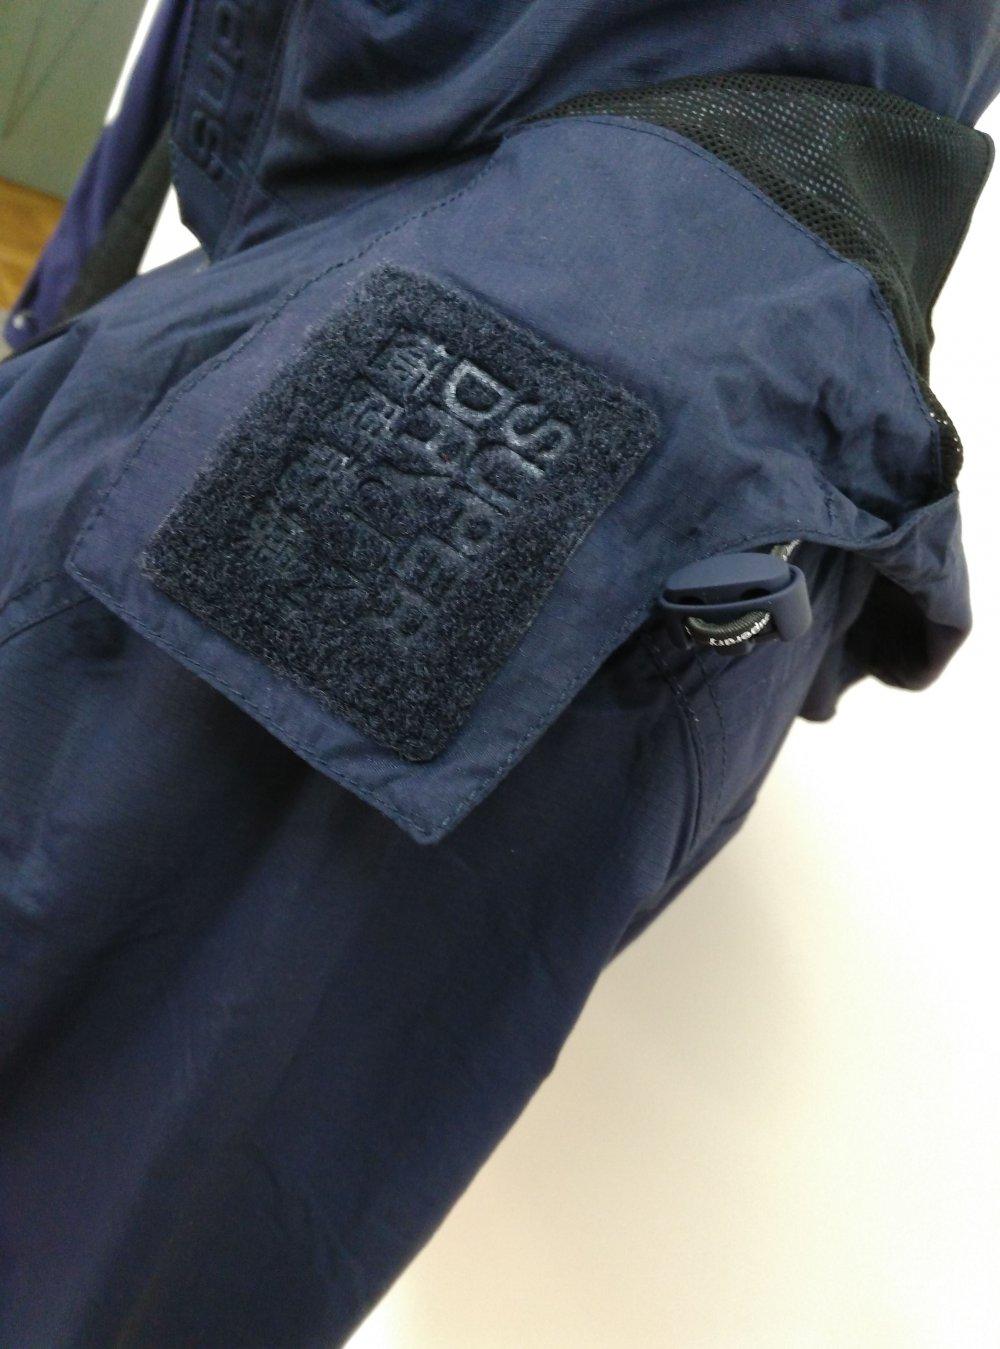 NEU! SuperDry leichte Jacke, Übergangsjacke, Gr. L